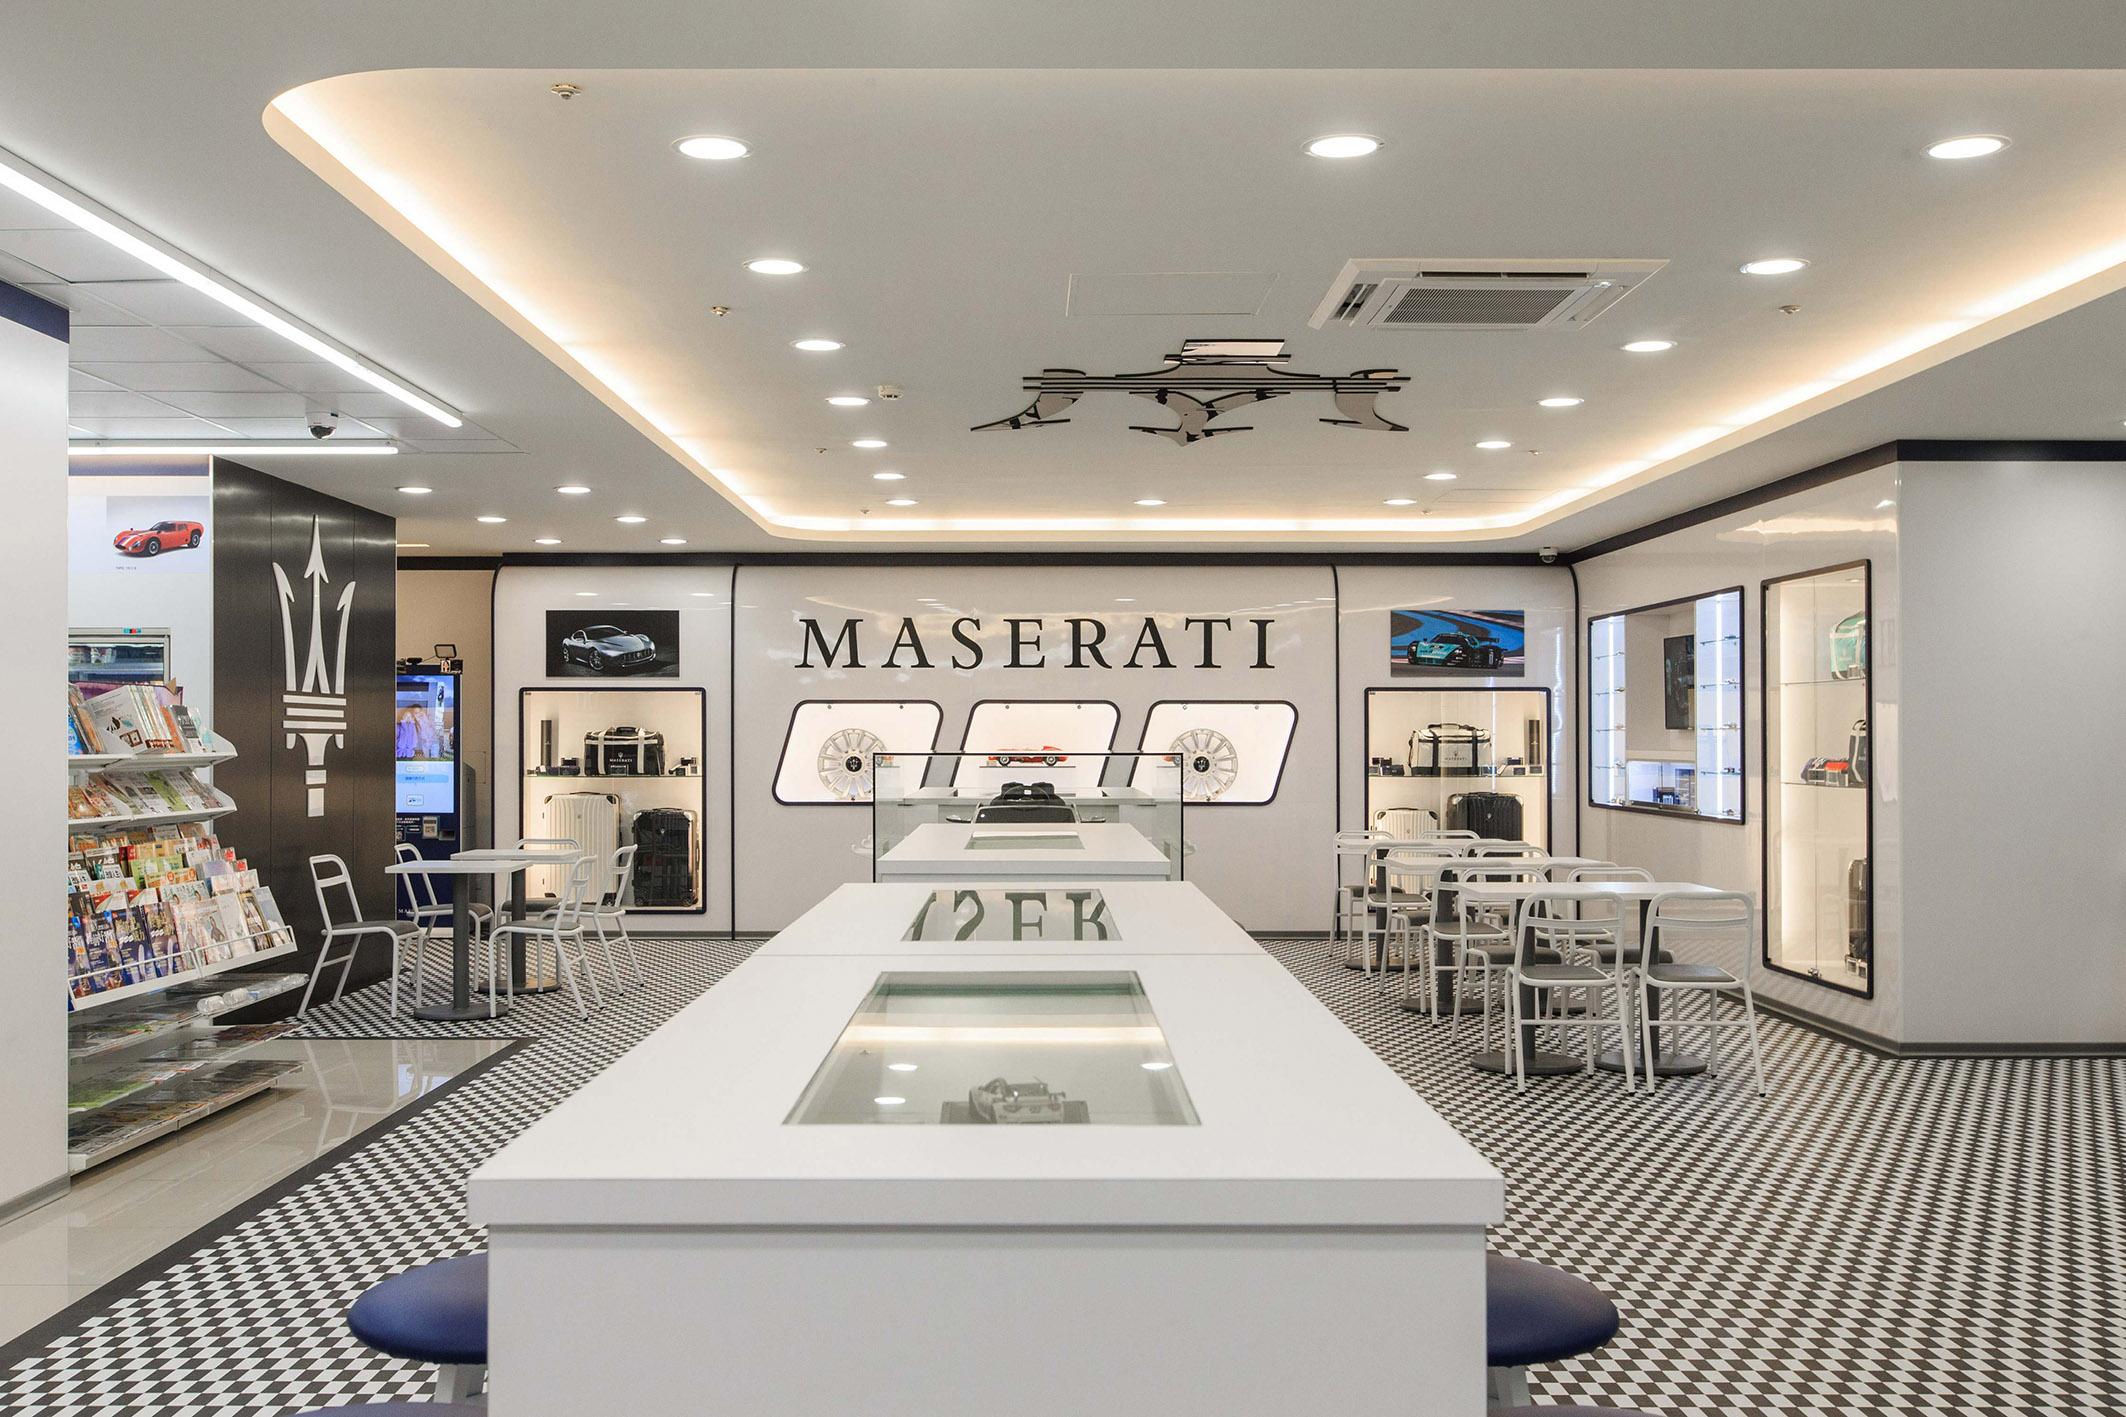 Maserati store